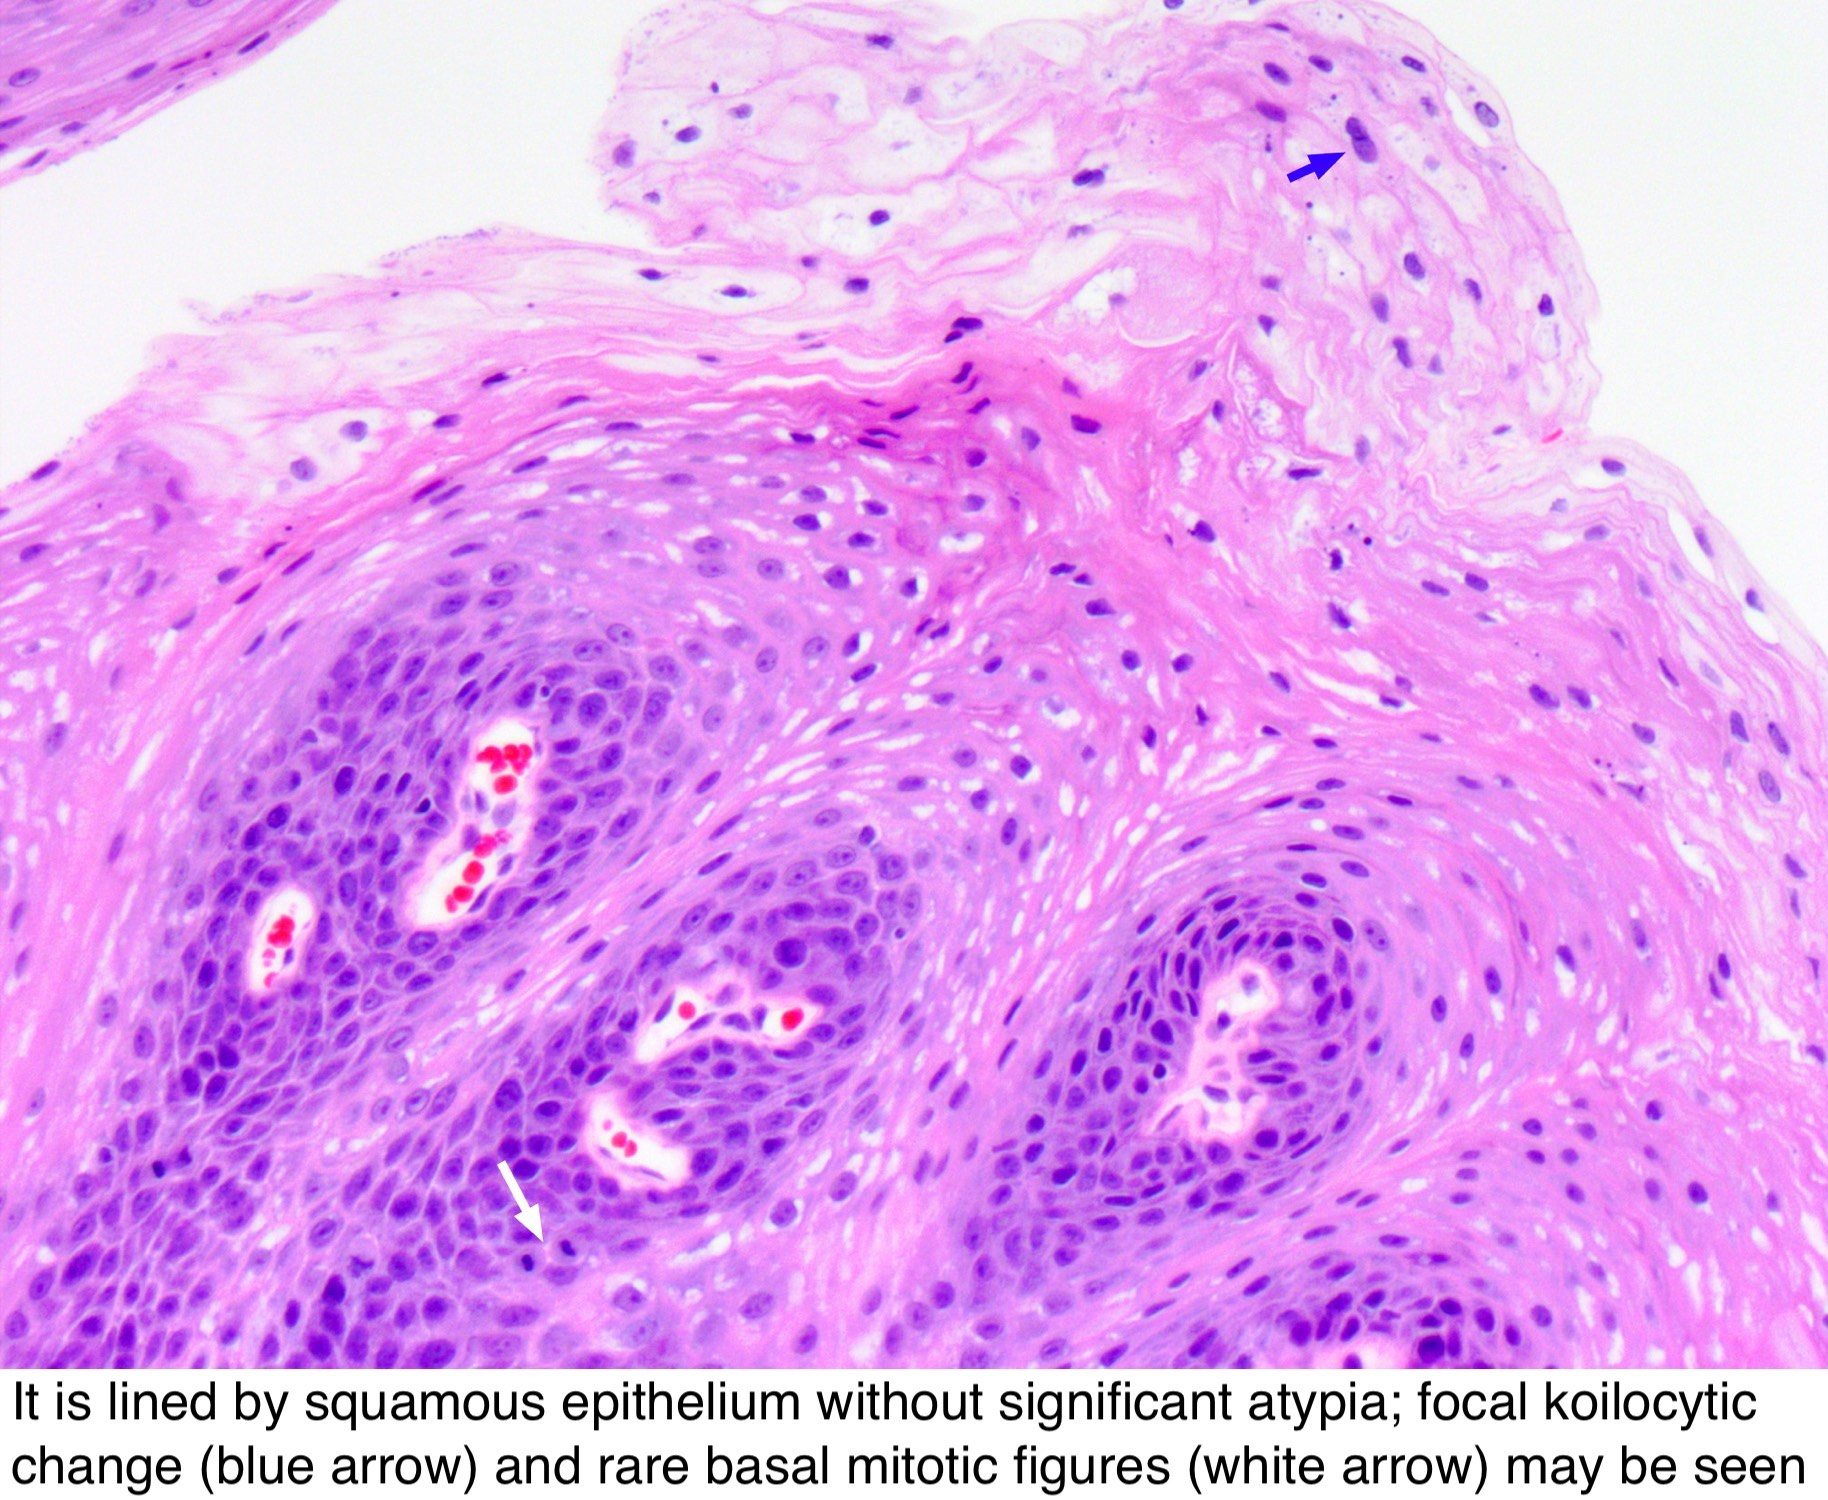 papillomavirus in lung cancer cancer de cuello papiloma humano